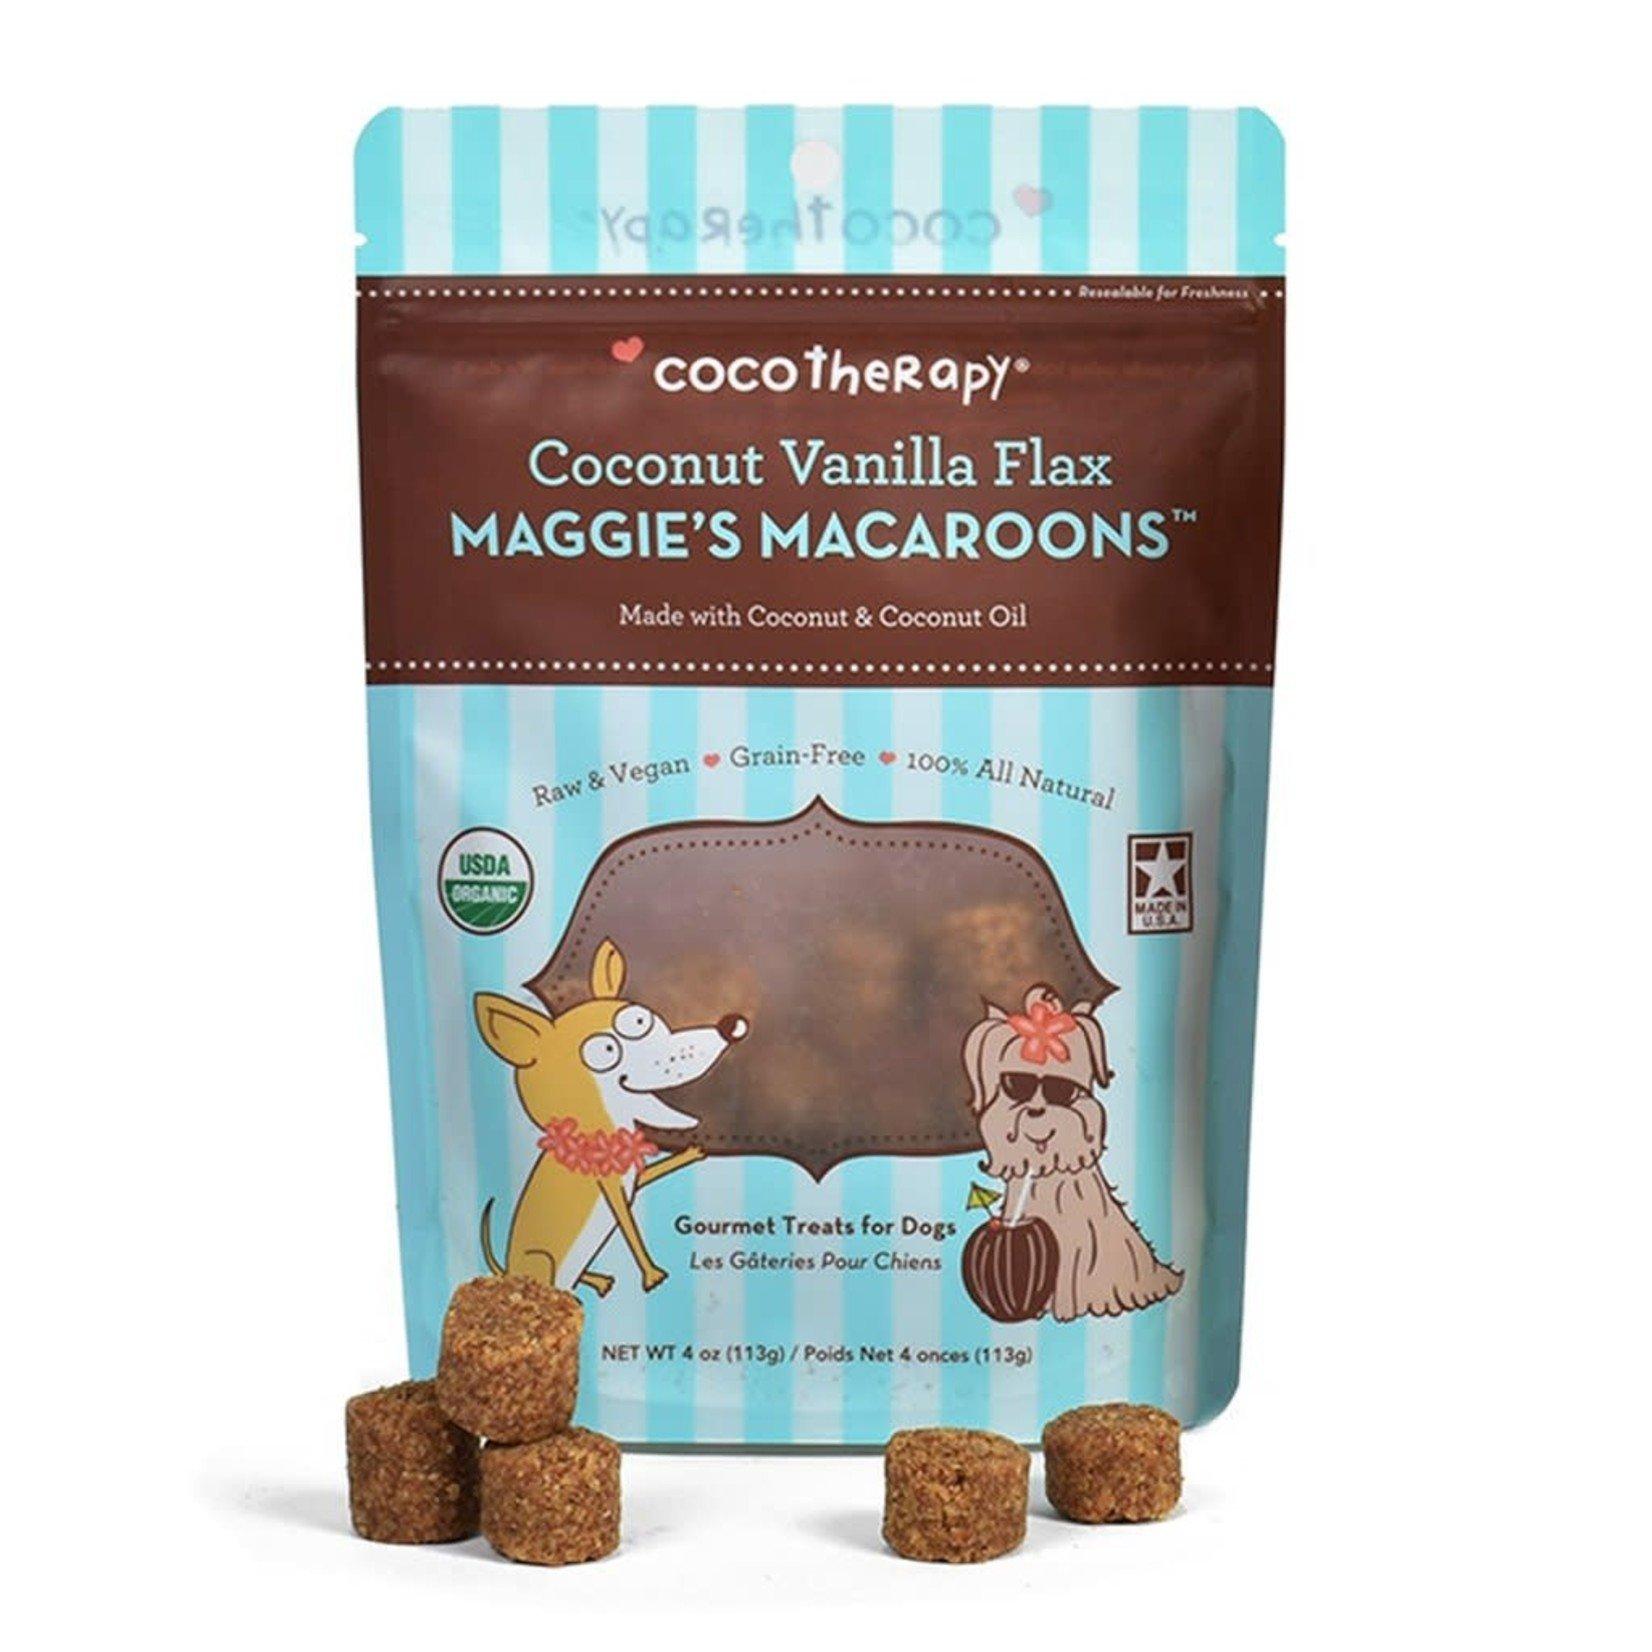 Coco Therapy Coco Therapy Vanilla Macaroons 4 OZ